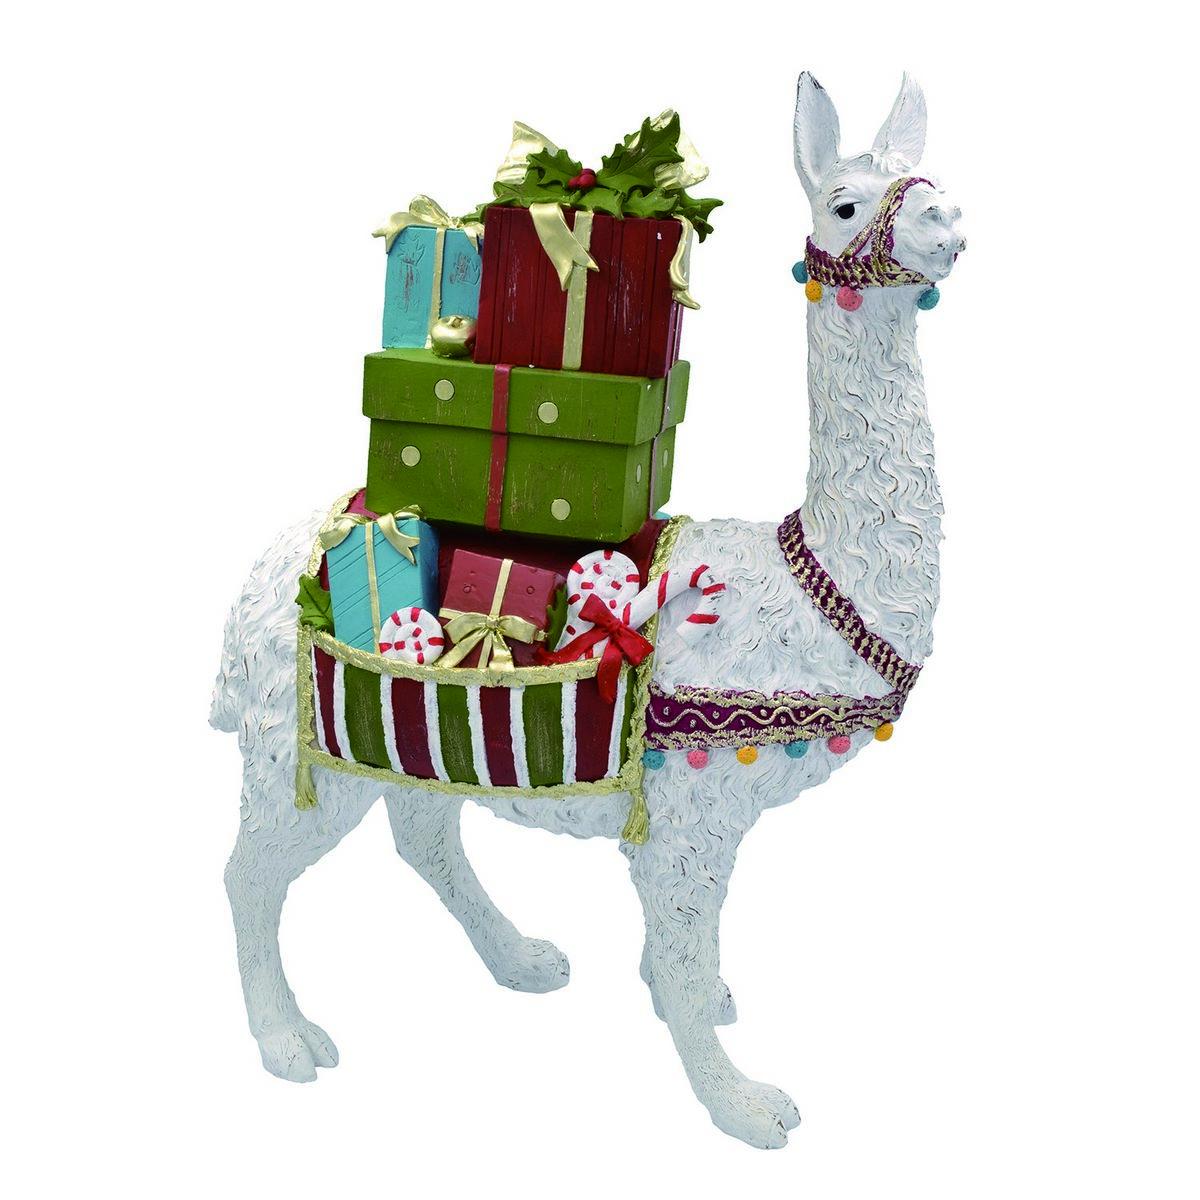 CARNAC/サンニュイオブジェ04/KNA04【01 》】【取寄】《 店舗ディスプレイ クリスマス飾り オブジェ・小物 》, Shoe Quest:a0640ad7 --- sunward.msk.ru